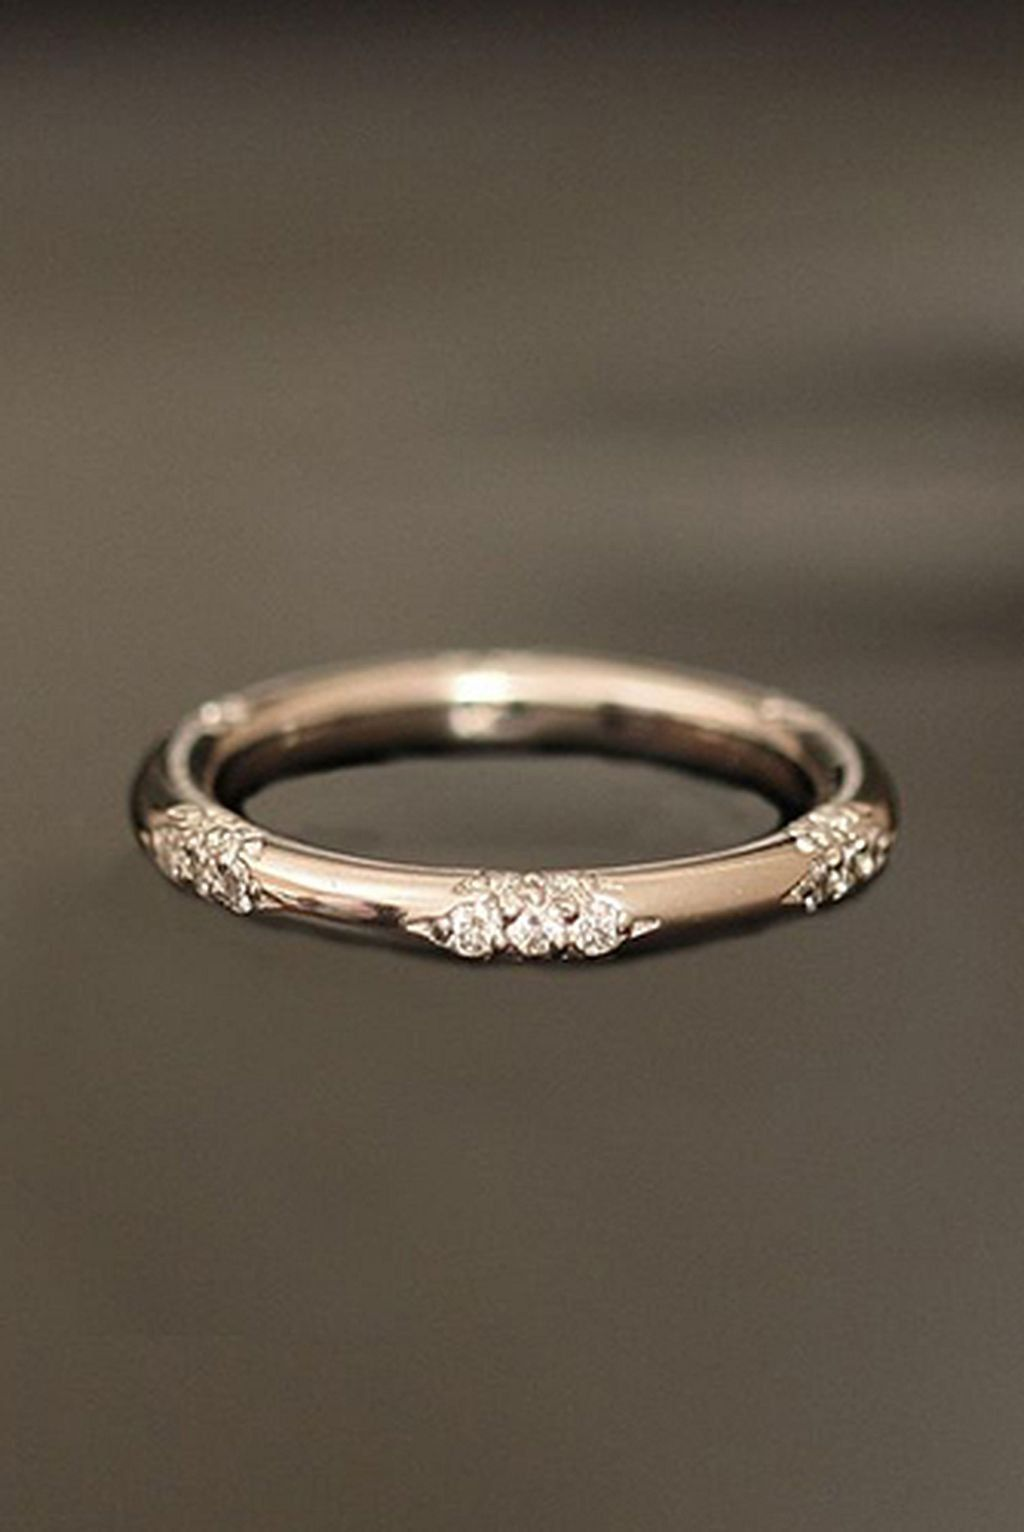 100 beautiful wedding ring ideas 10 beautiful wedding rings ring 100 beautiful wedding ring ideas 10 junglespirit Choice Image